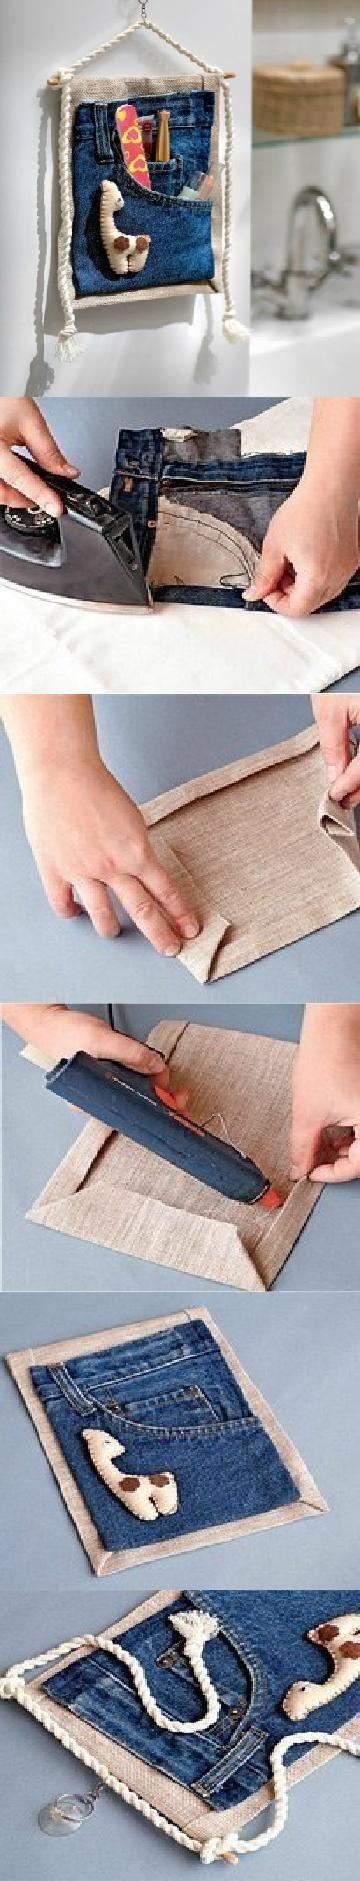 DIY jeans refashion: DIY Old Jeans Organizer